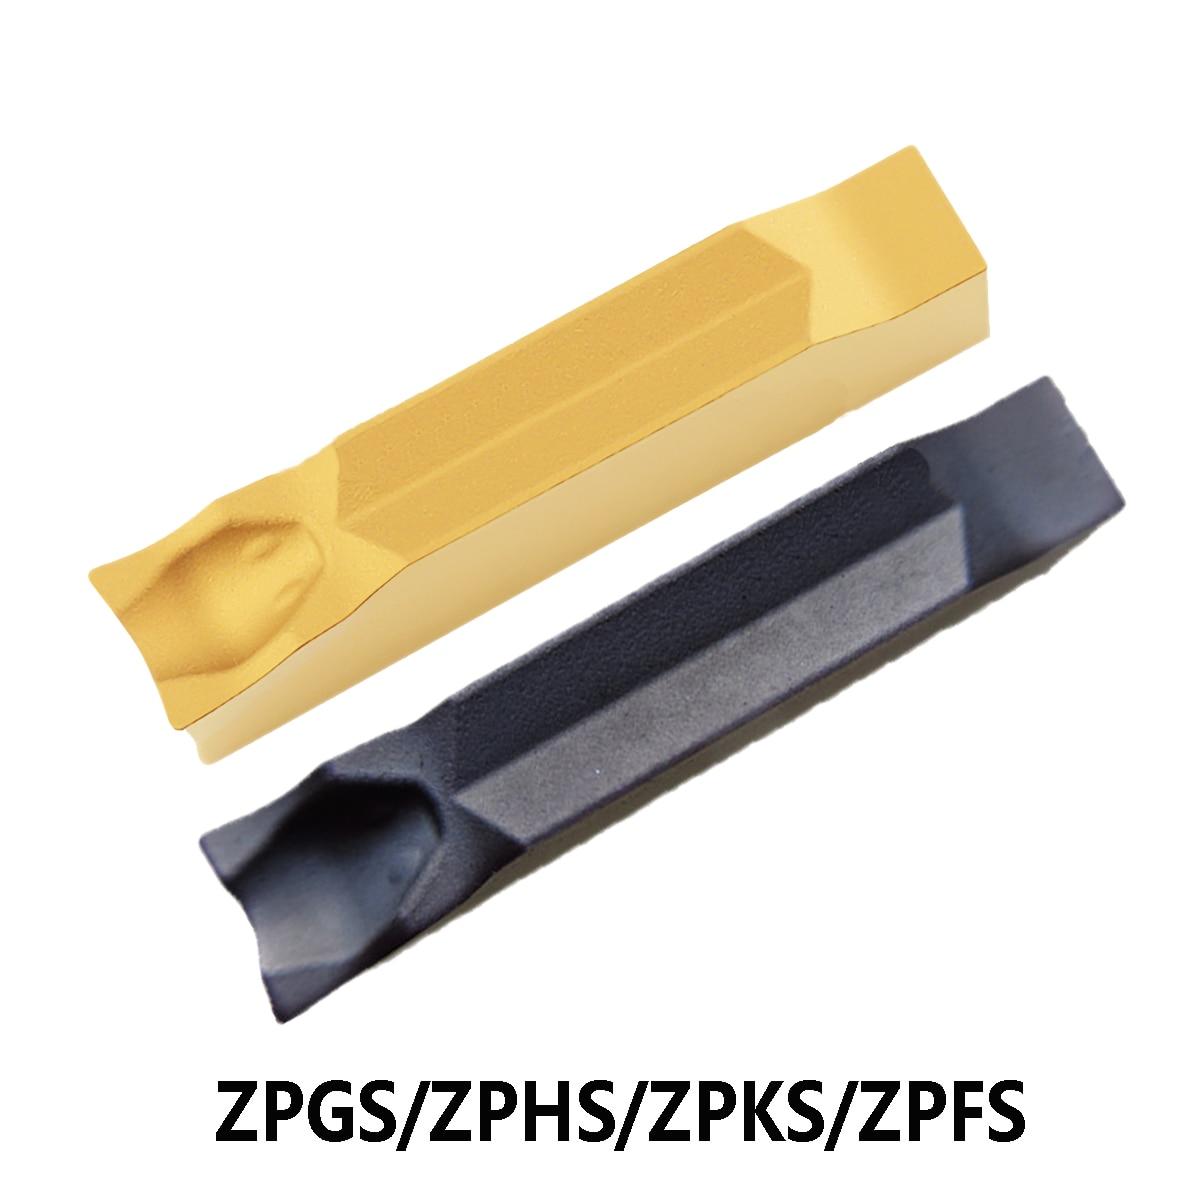 ZPFS0302-MG ZPGS0402-MG YBC251 YBG202 ZPHS0503-MG ZPKS0604-MG YBG302 الحز إدراج تحول أدوات مخرطة القاطع ZPGS